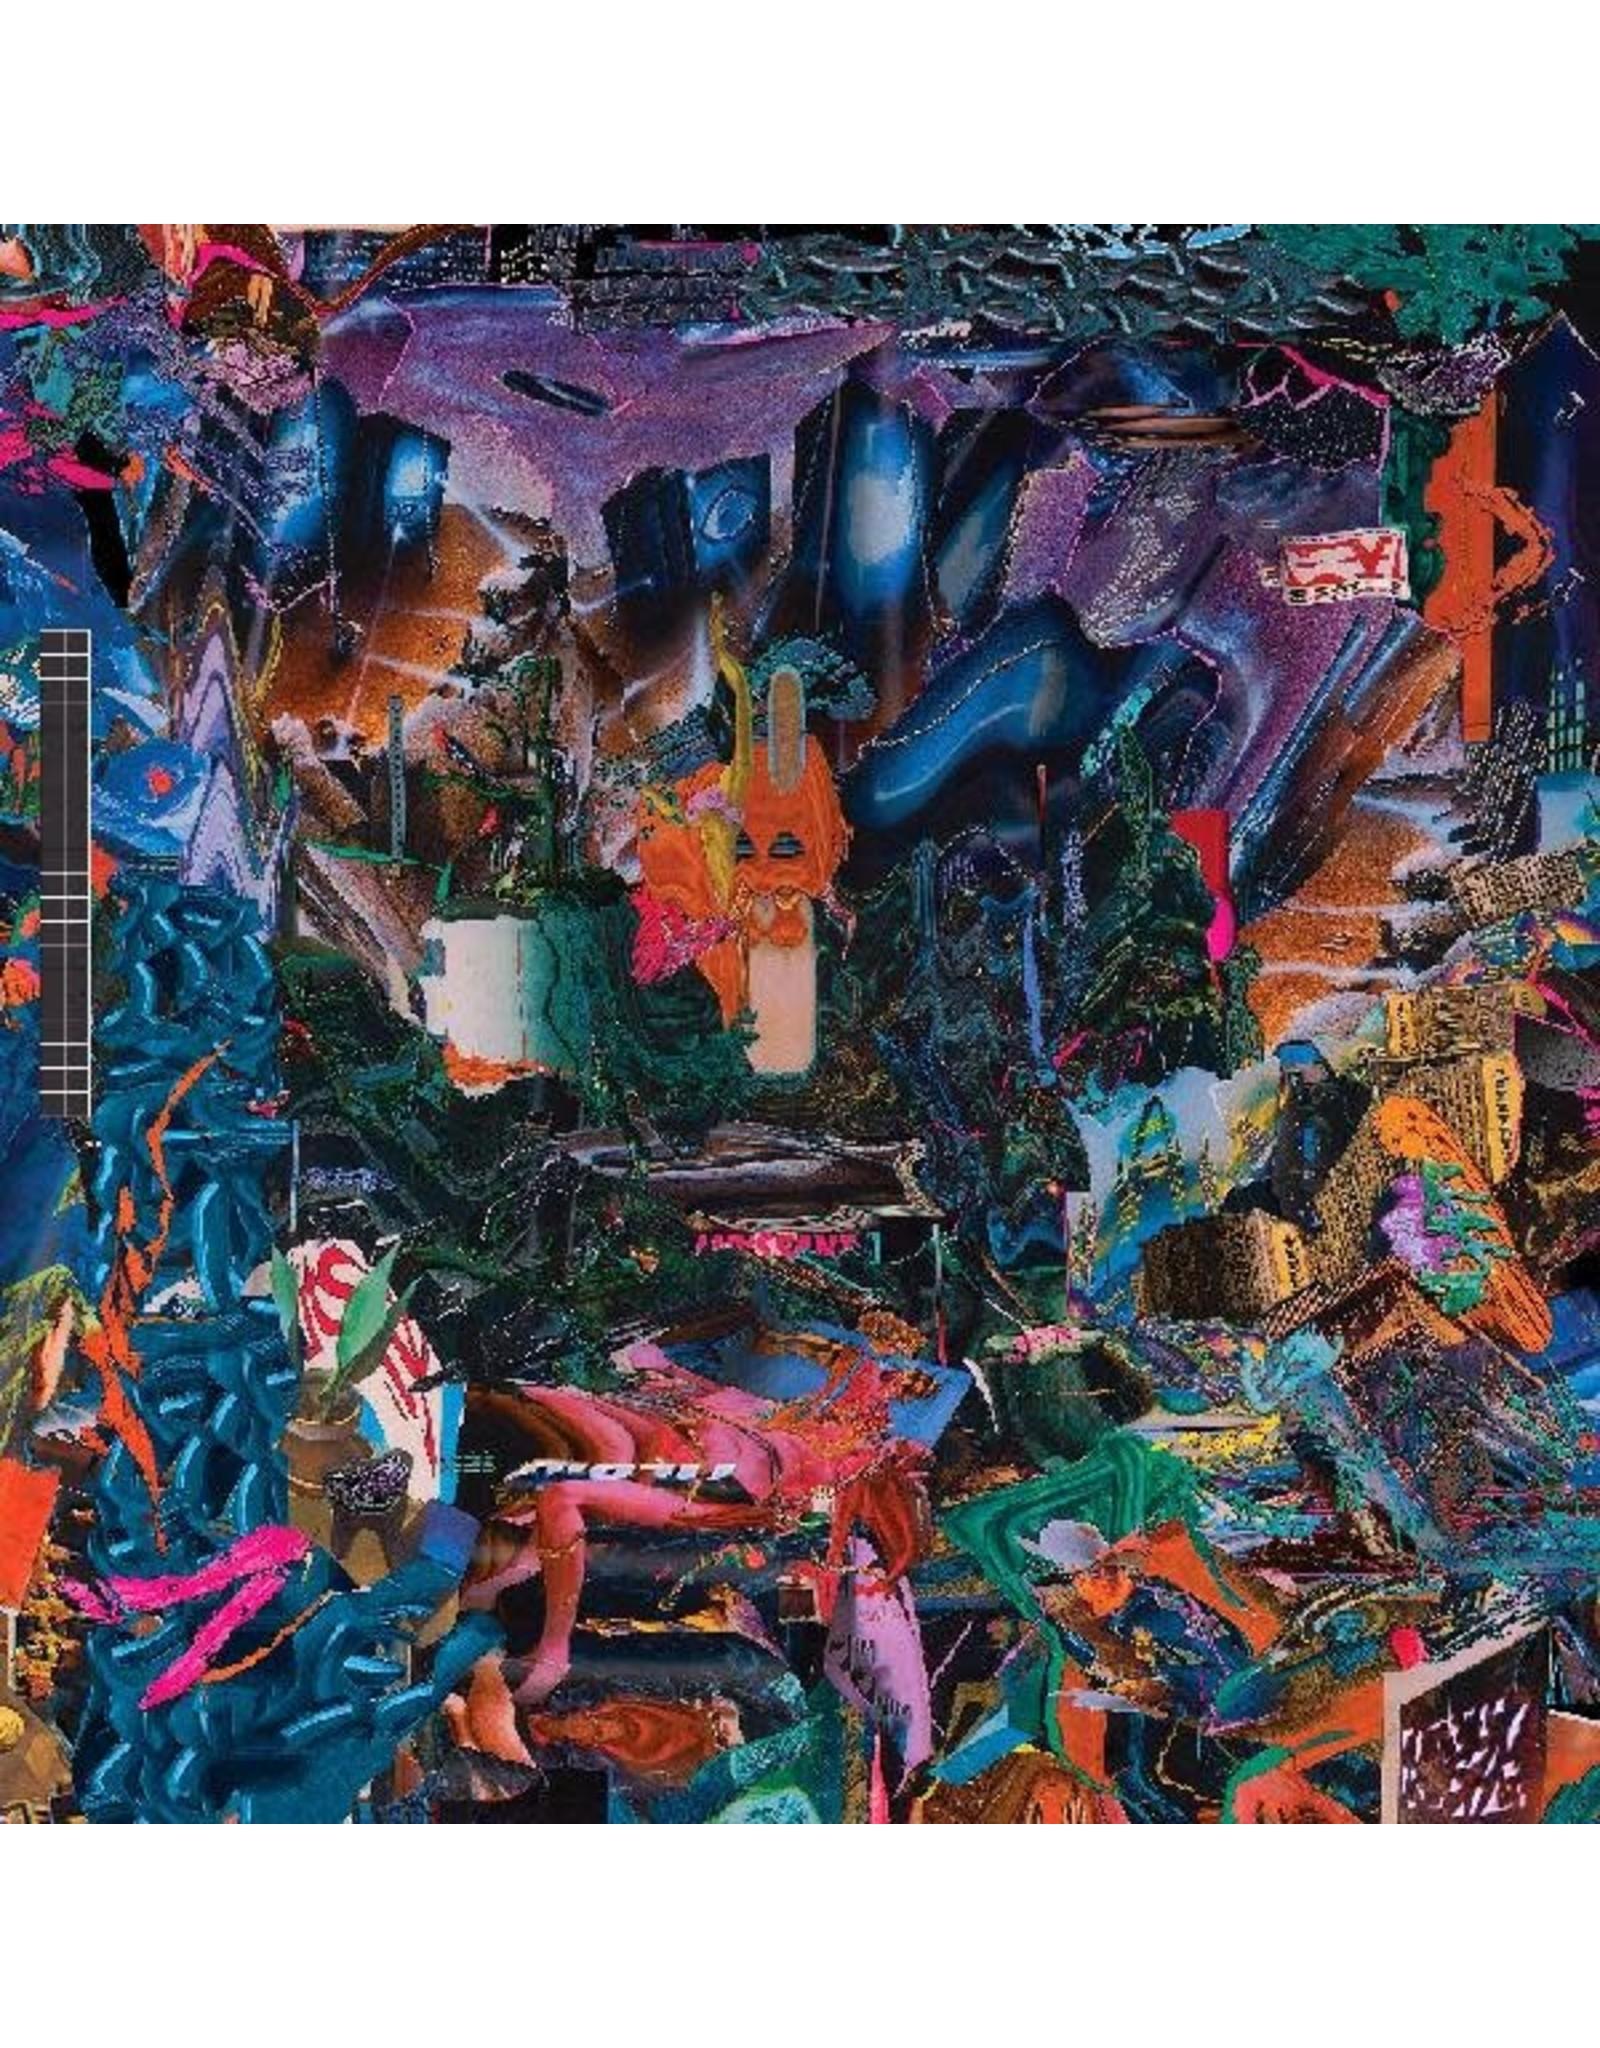 New Vinyl black midi - Cavalcade LP